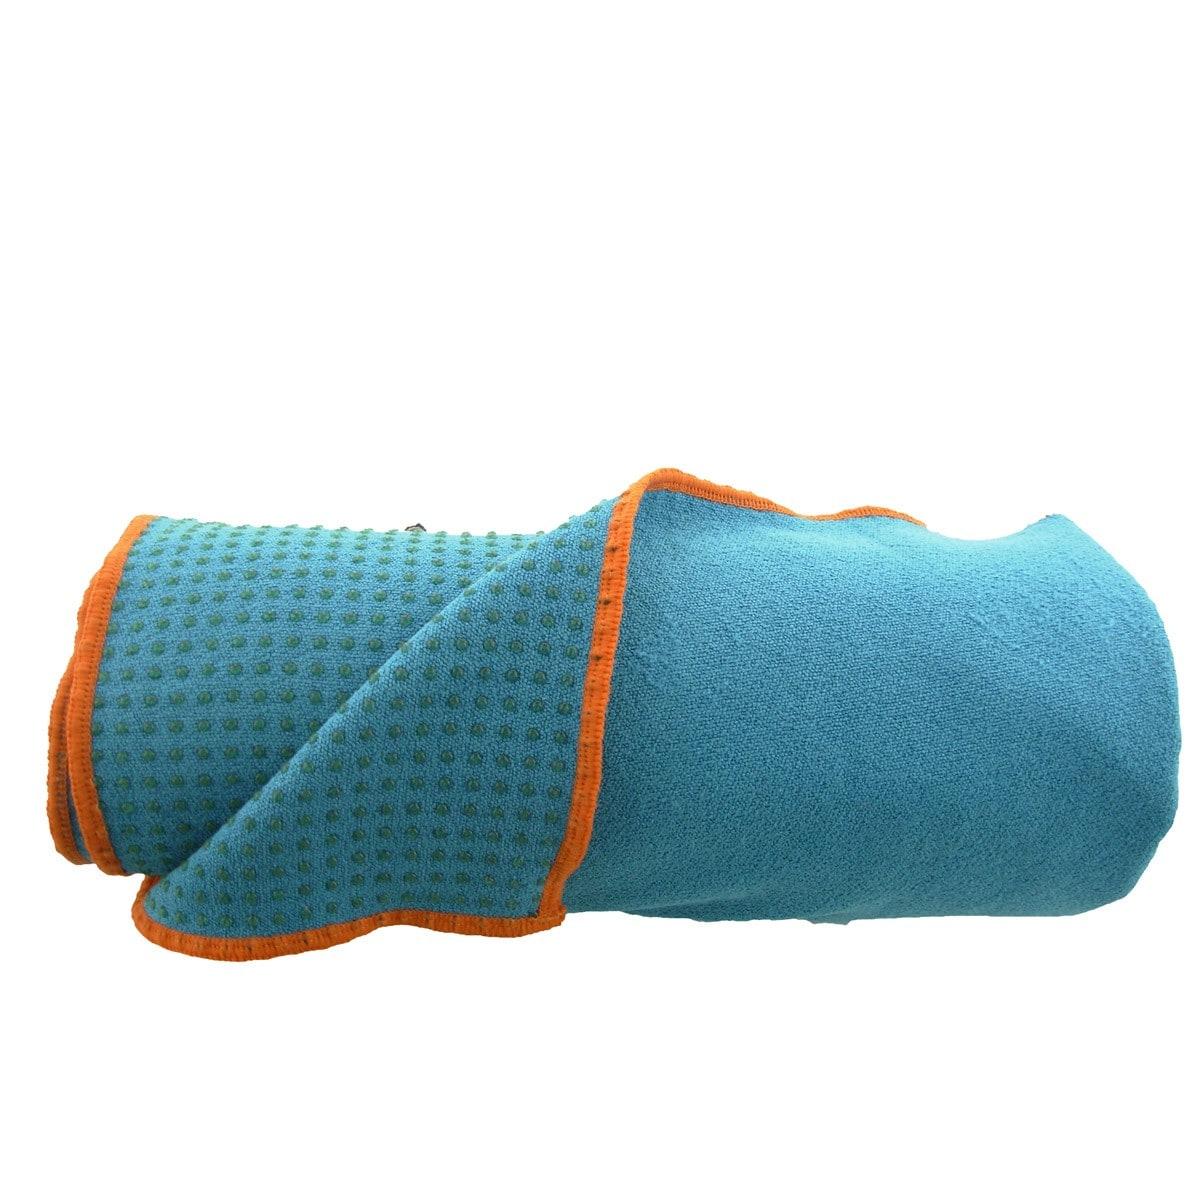 Shop Black Friday Deals On Yogitoes Skidless Yoga Mat Towel Overstock 6232337